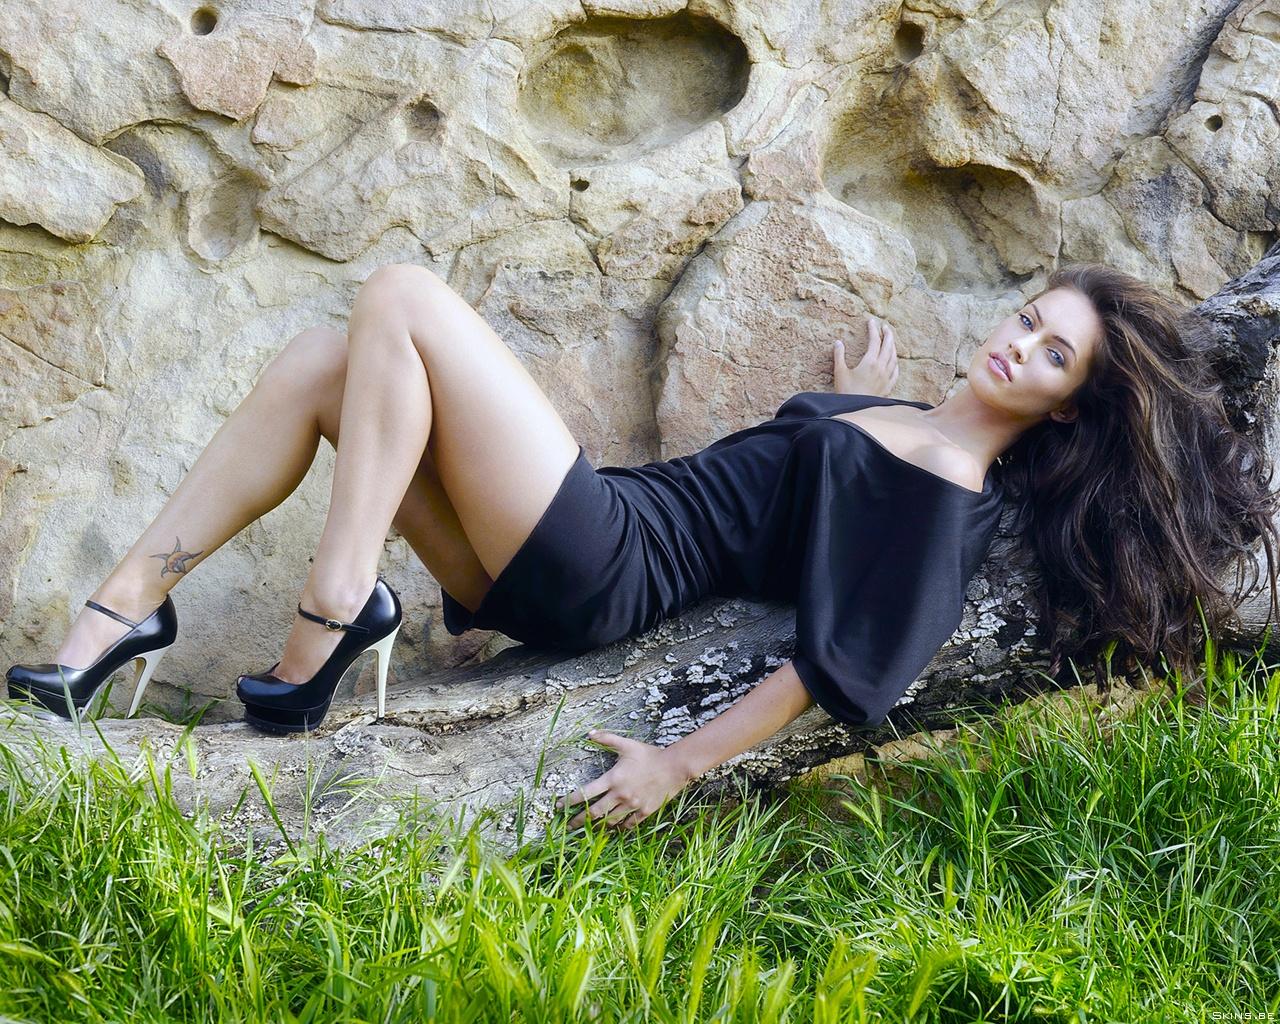 http://2.bp.blogspot.com/-u6KyL8cbBK4/UCWd4ebD33I/AAAAAAAACuk/LNxNnuC4PIQ/s1600/megan-fox-1280x1024-37964.jpg